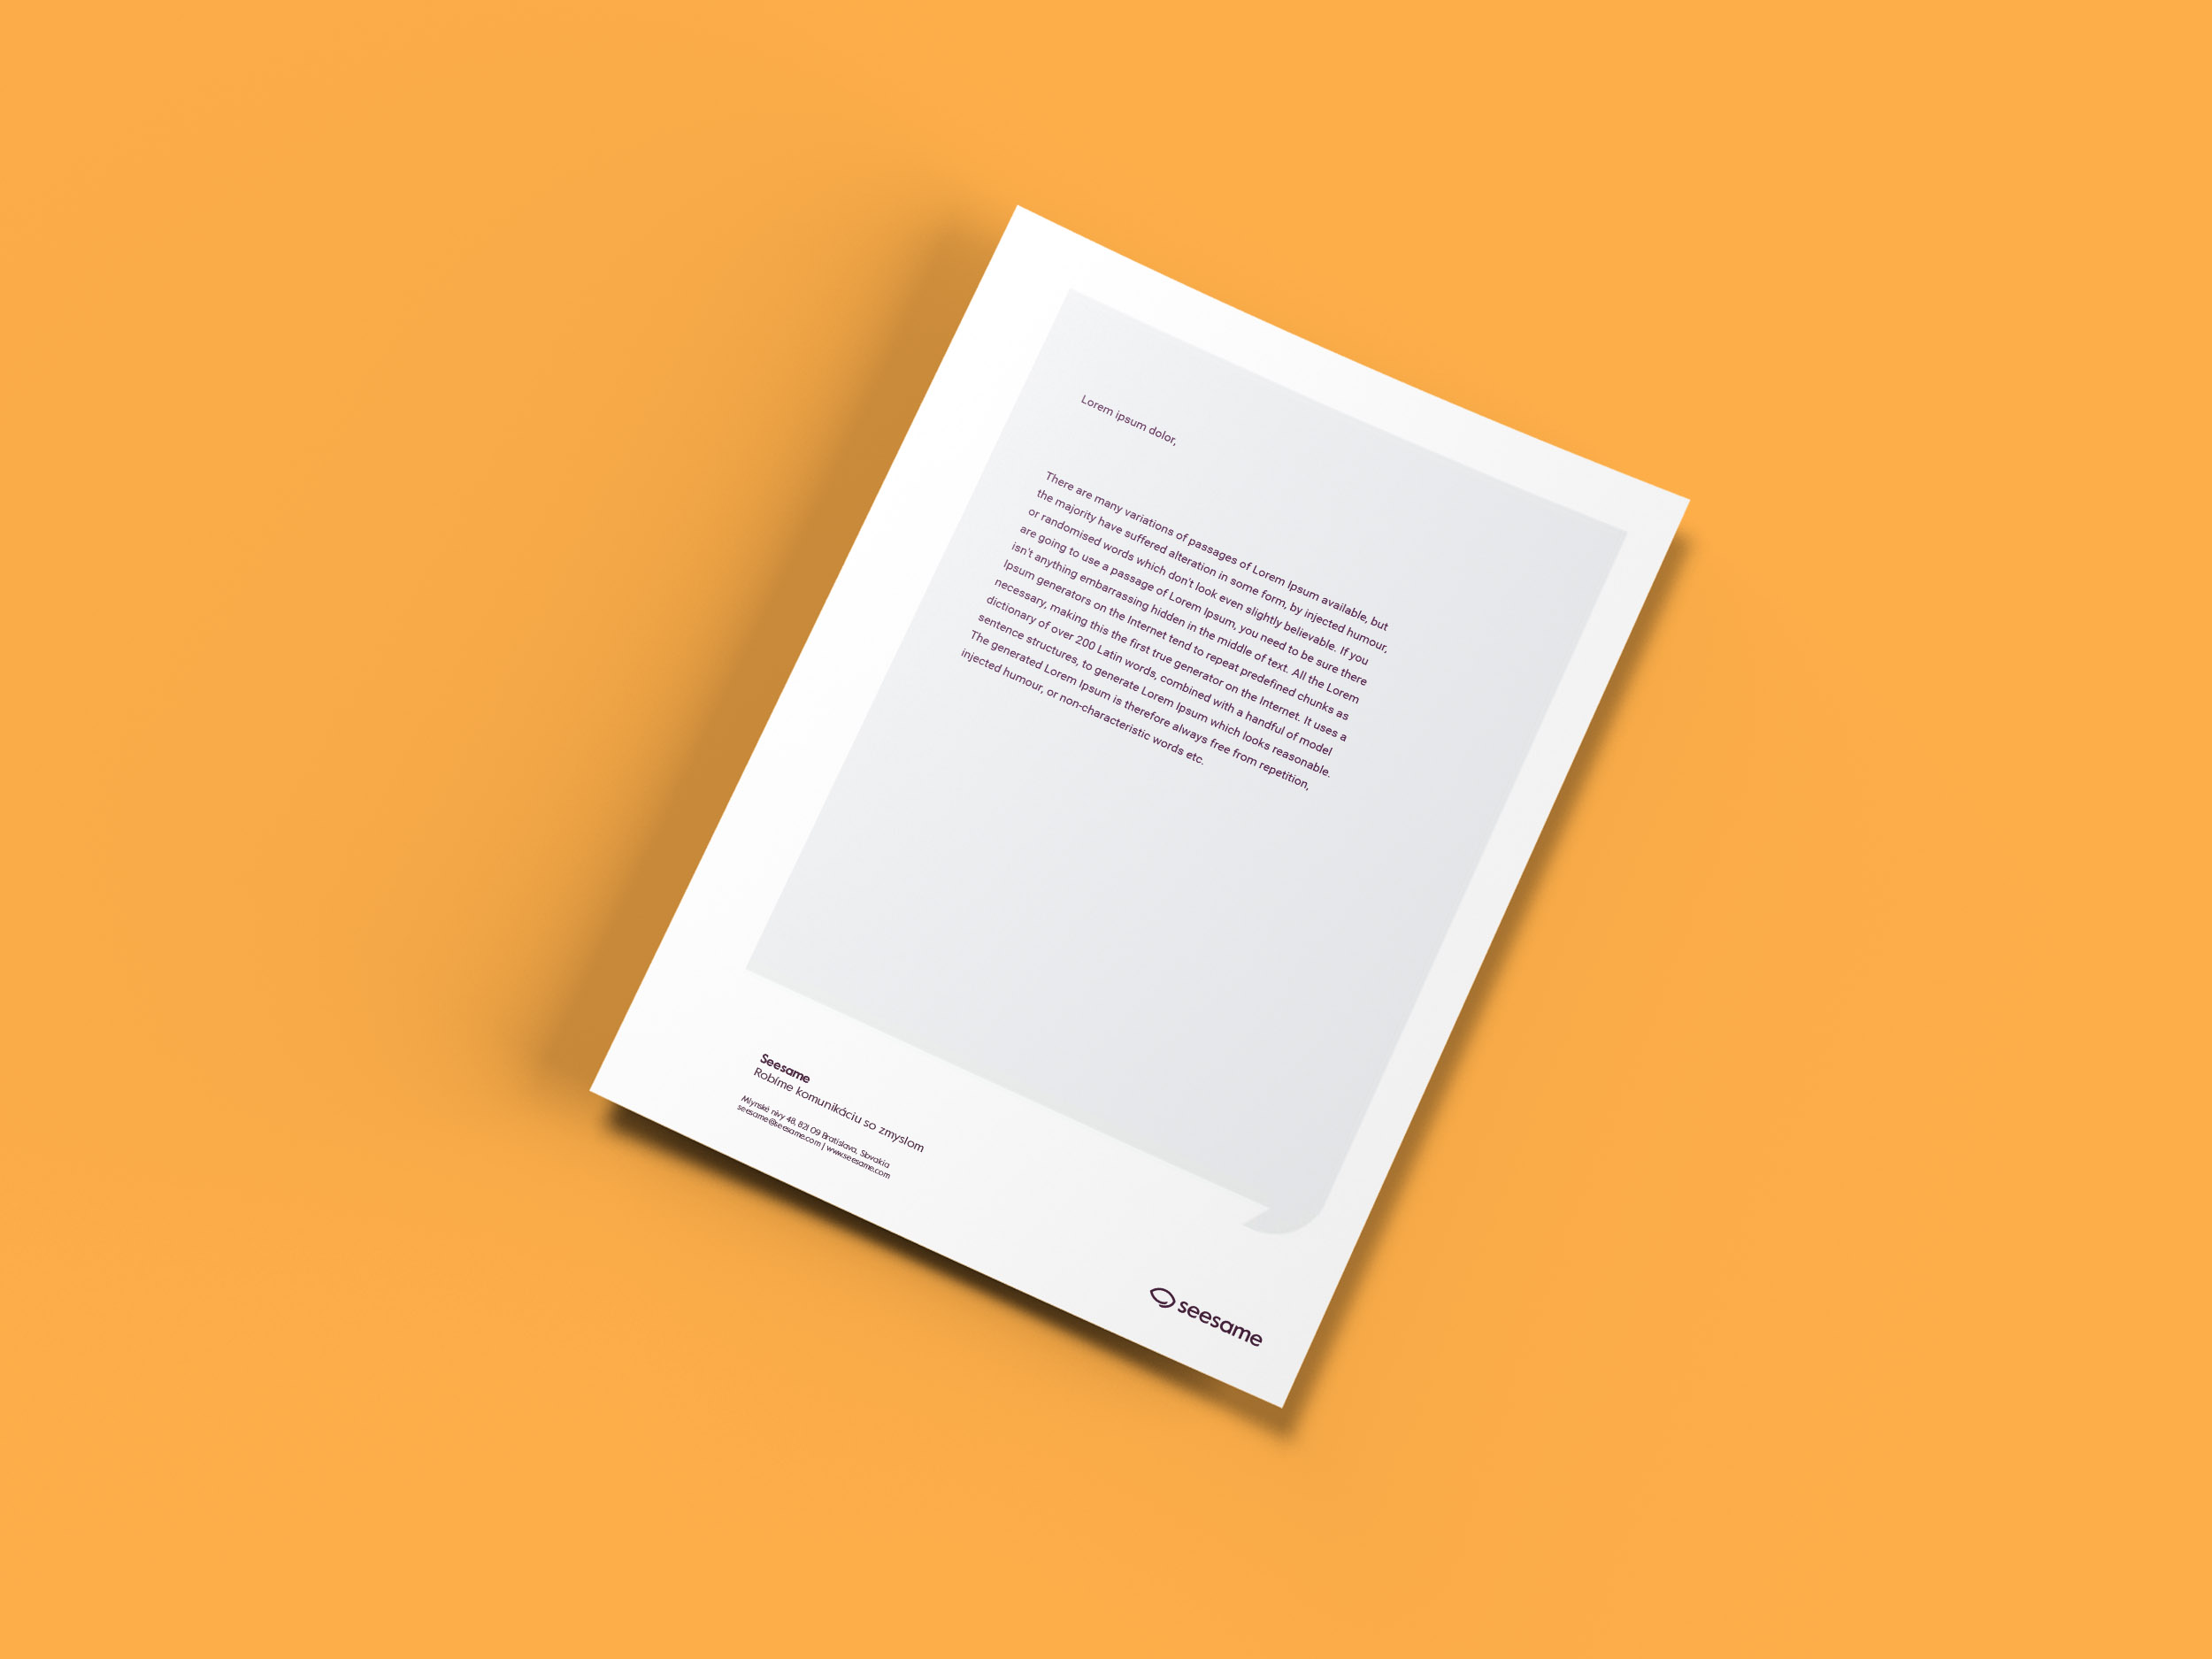 https://d3i9l7sj72swdx.cloudfront.net/seesame/2021/01/letterhead-1.jpg